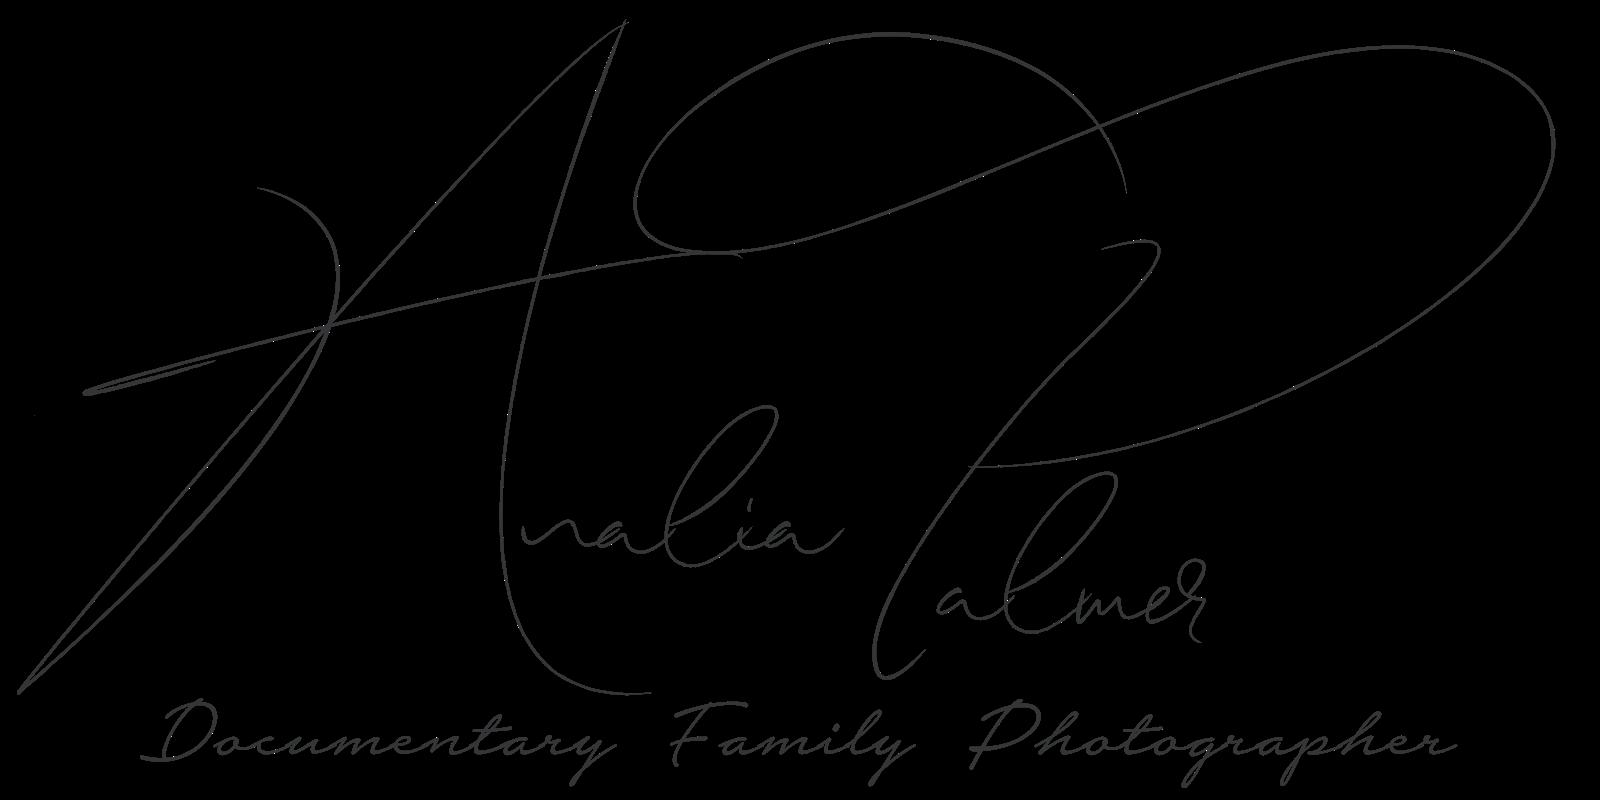 AnaliaPalmer